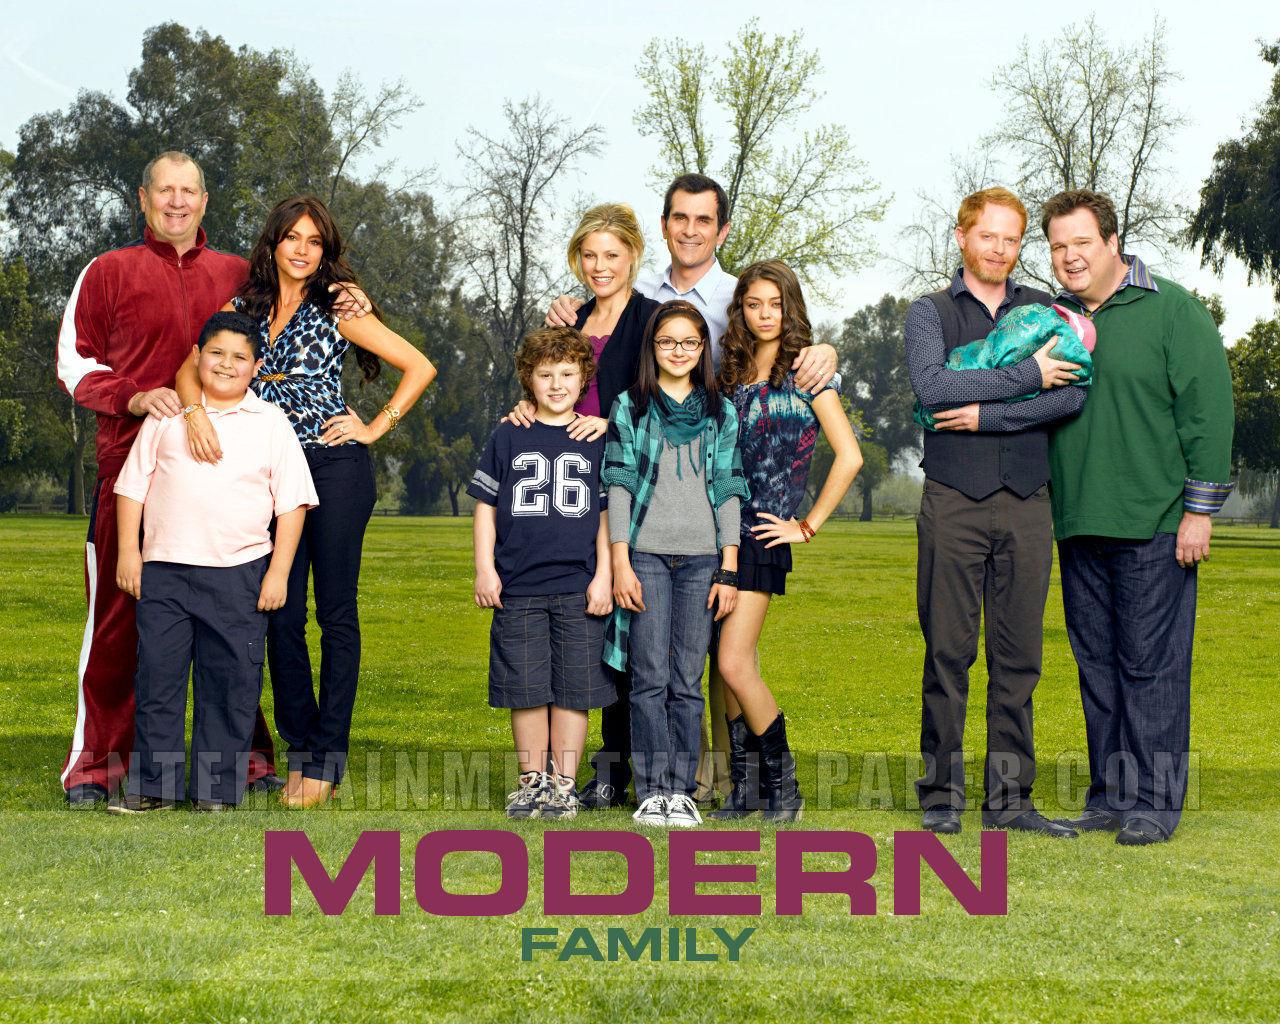 Modern Family Wallpaper   Modern Family Wallpaper 8938506 1280x1024